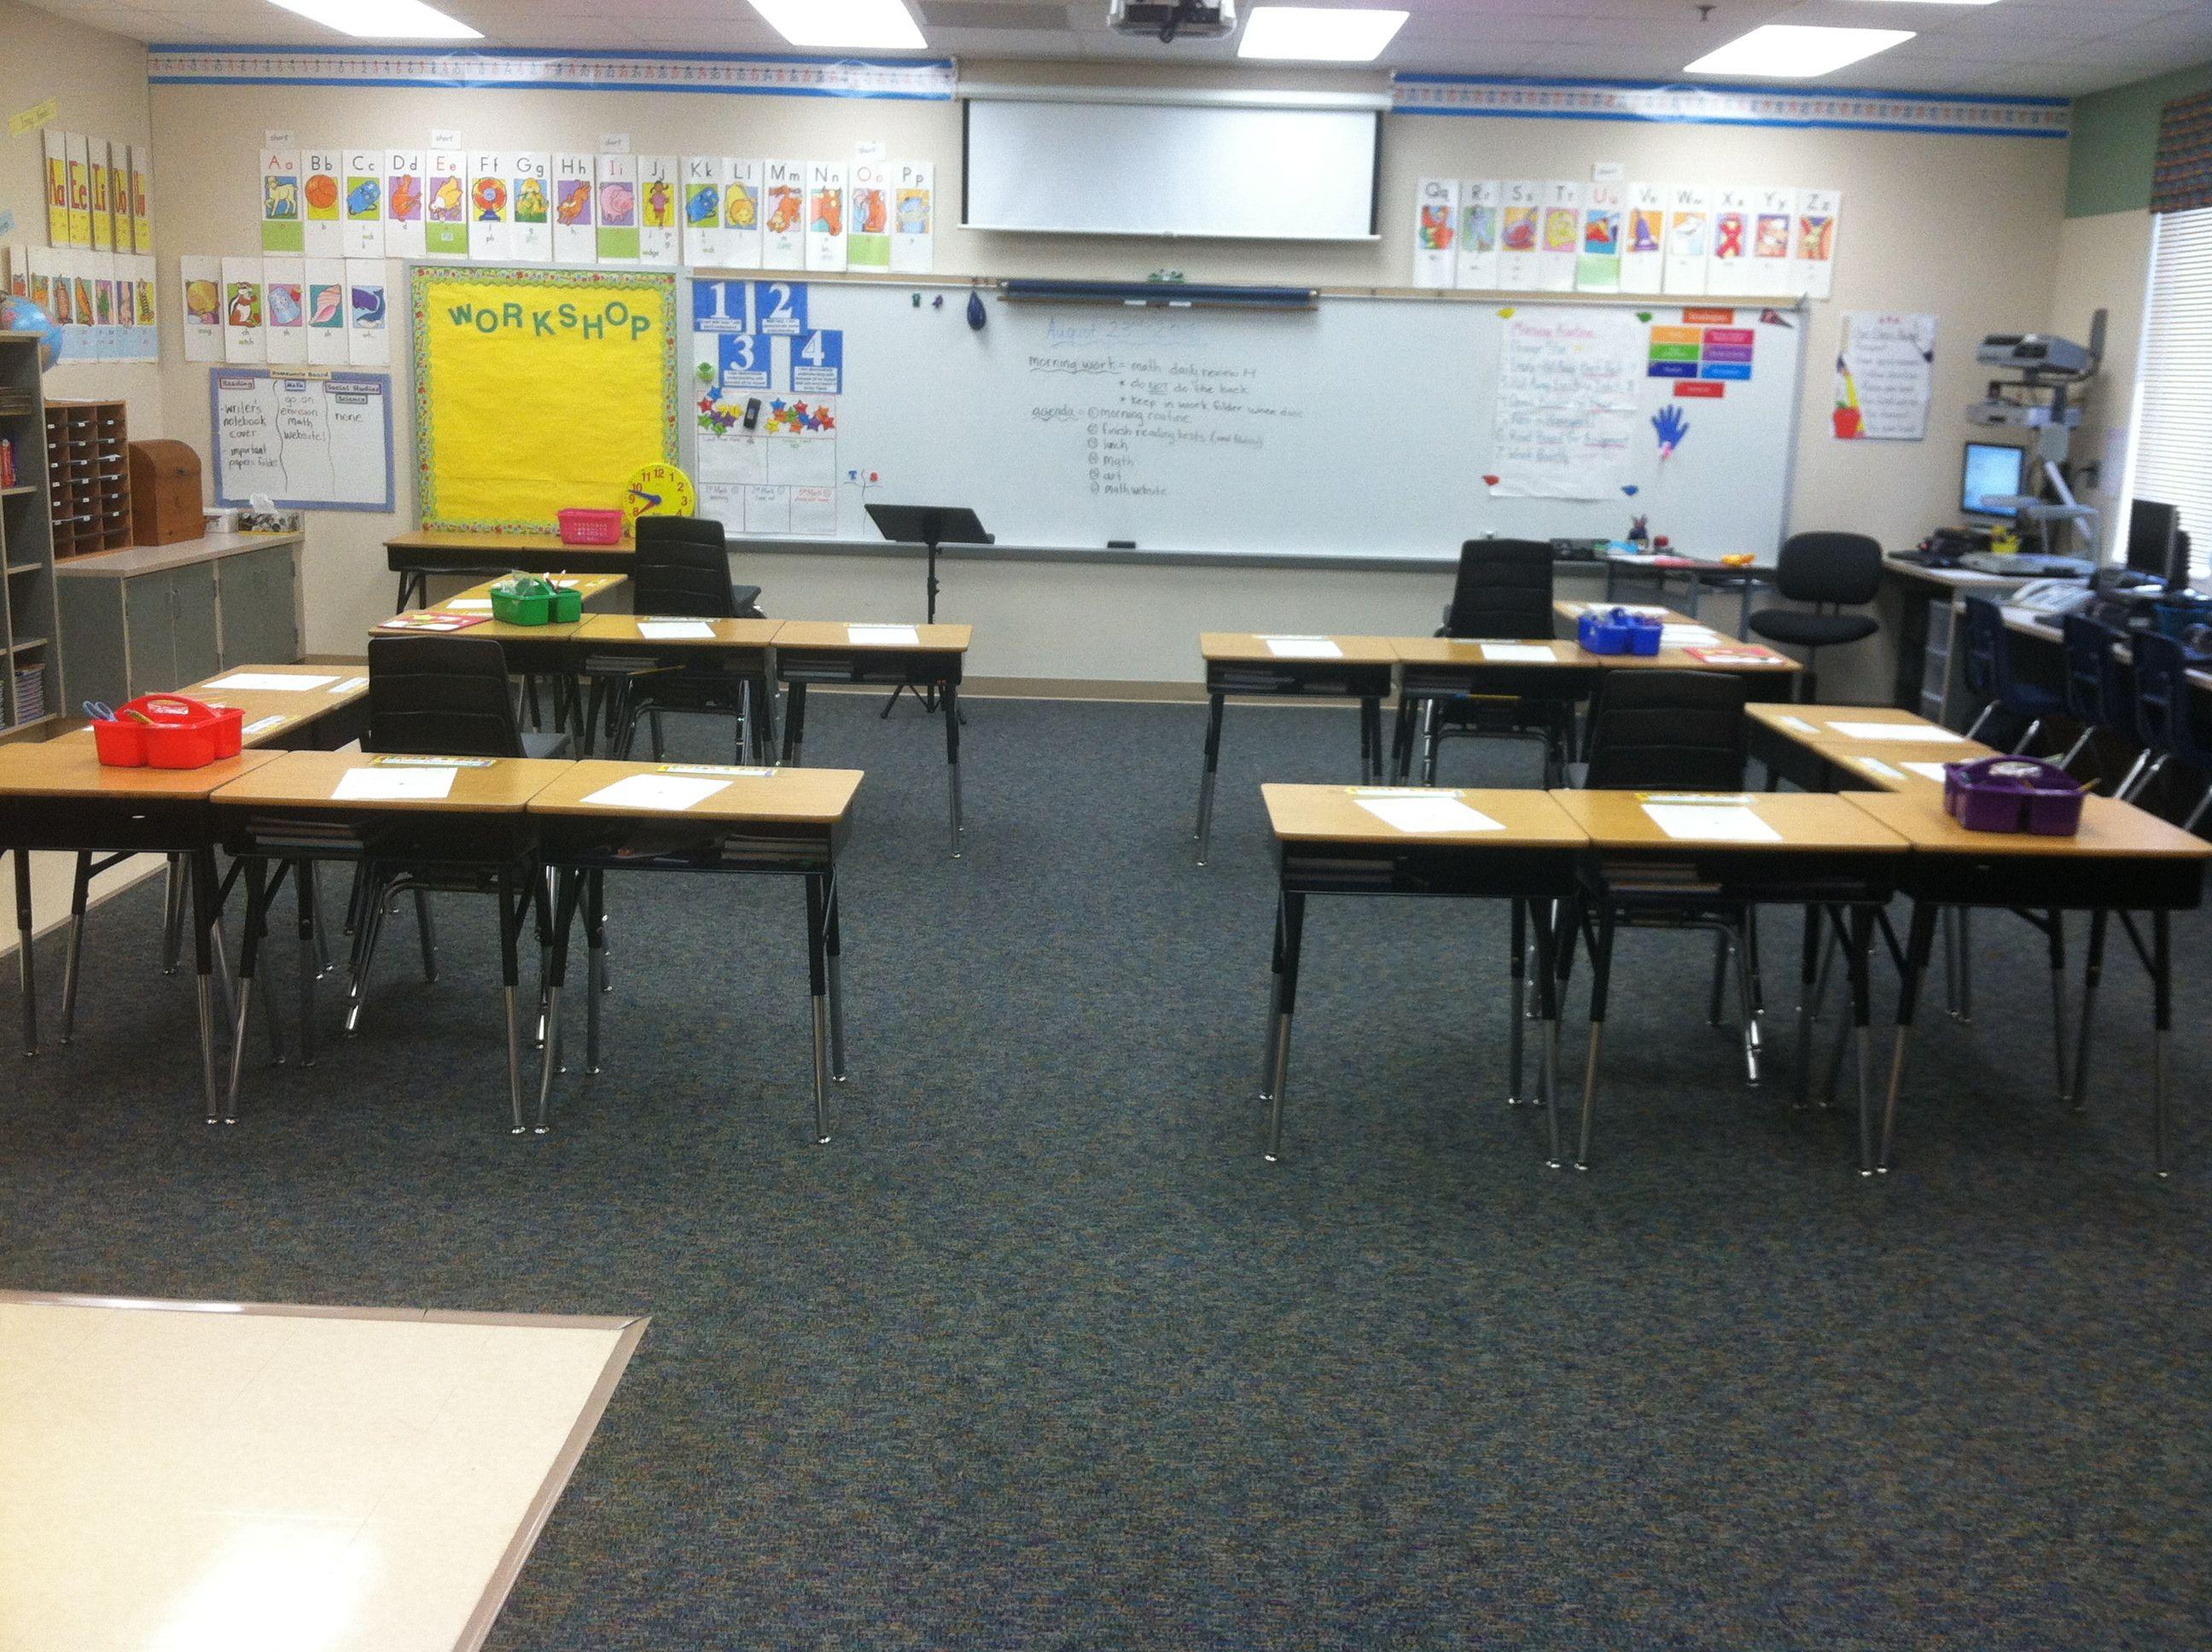 Desk arrangement classroom pinterest desks for Tables and desks in the classroom